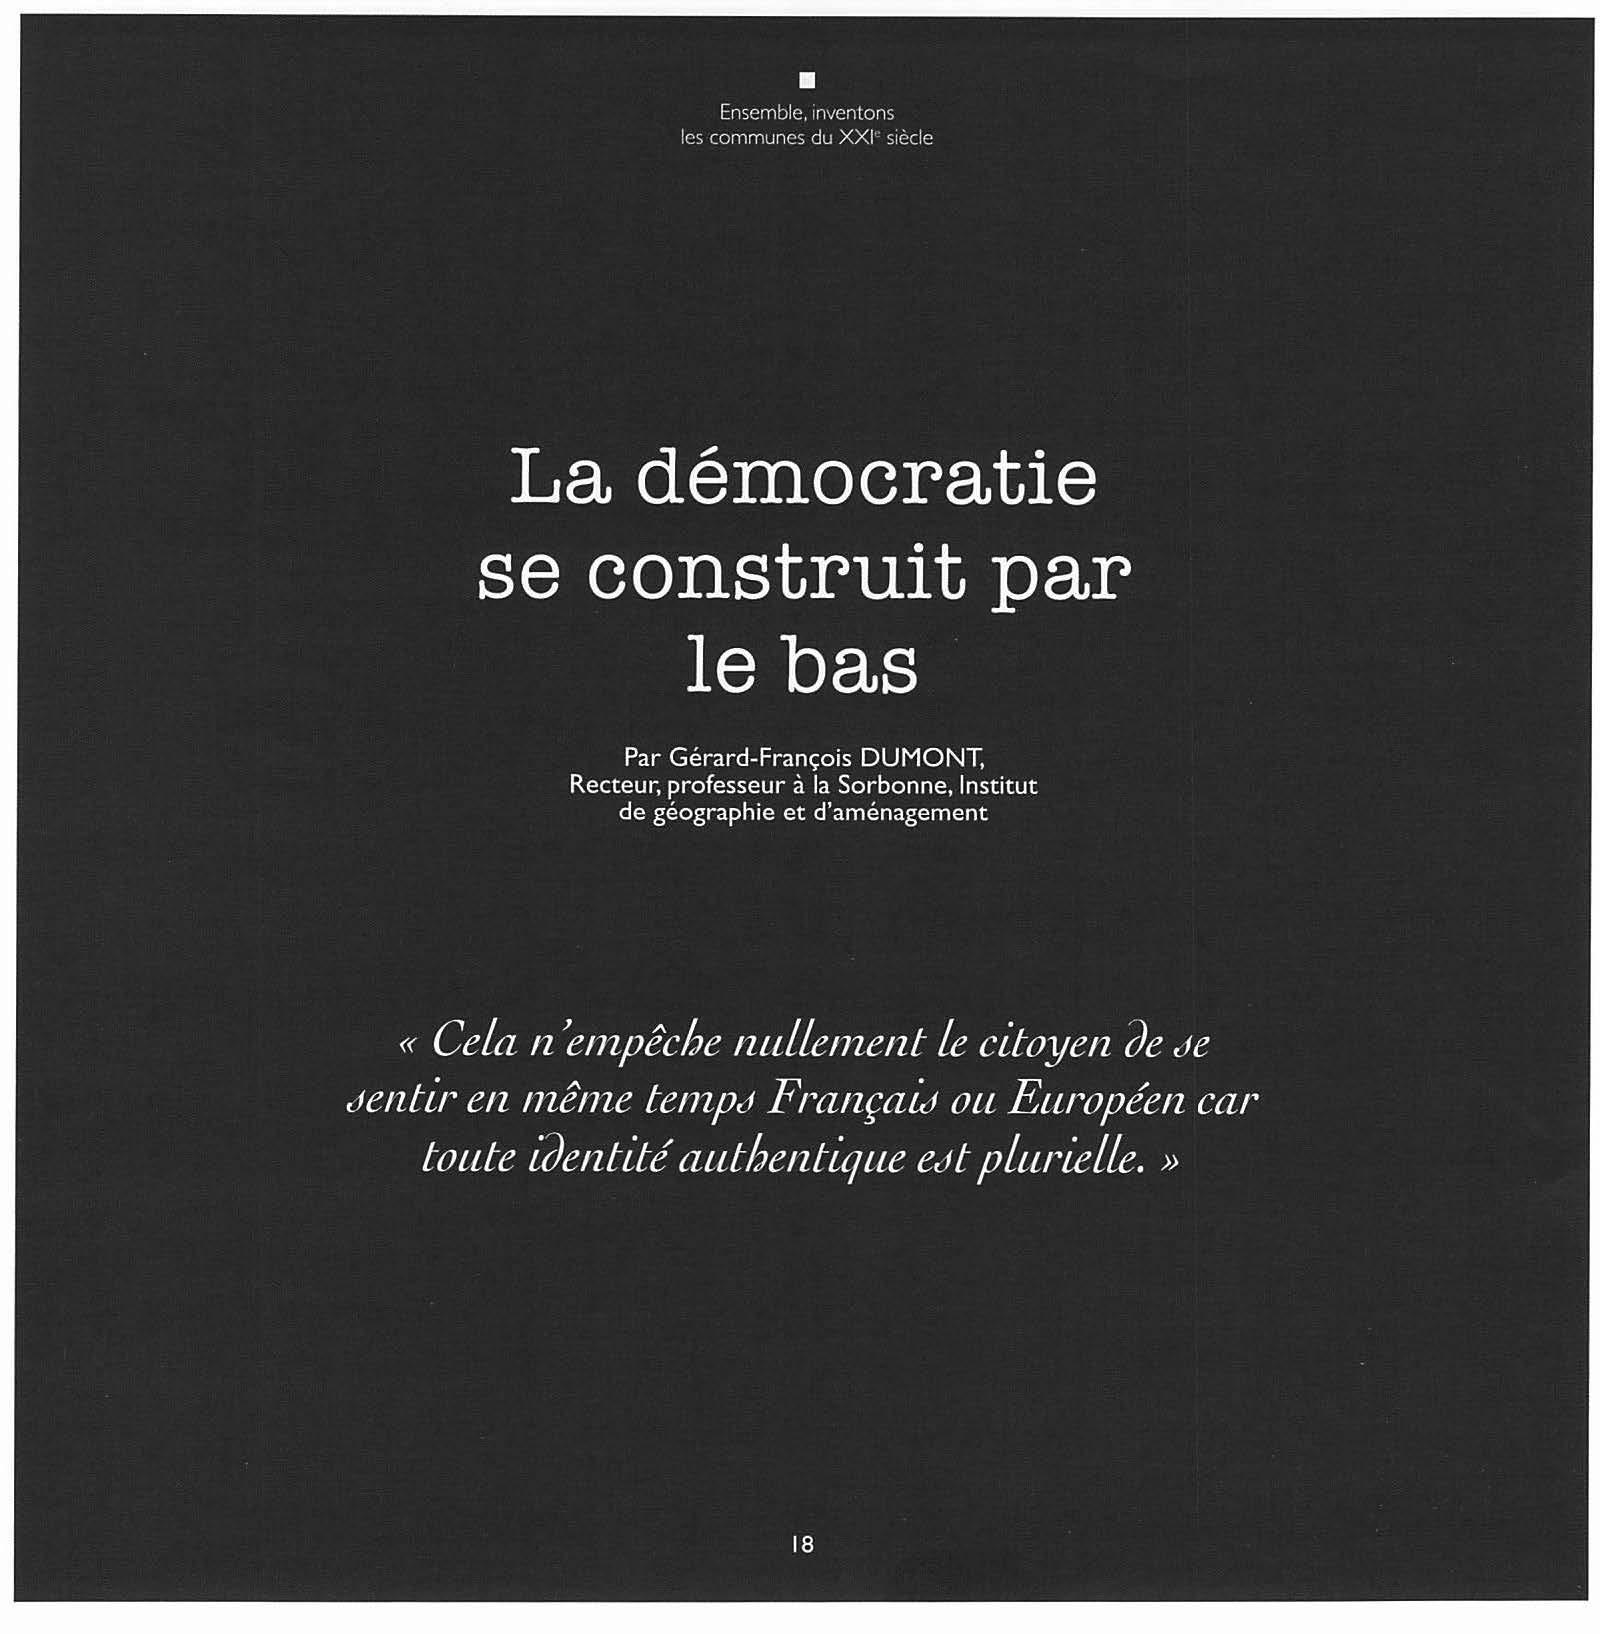 H174-1771-AMF COMMUNEXXI DEMOCRATIE GFD_Page_1